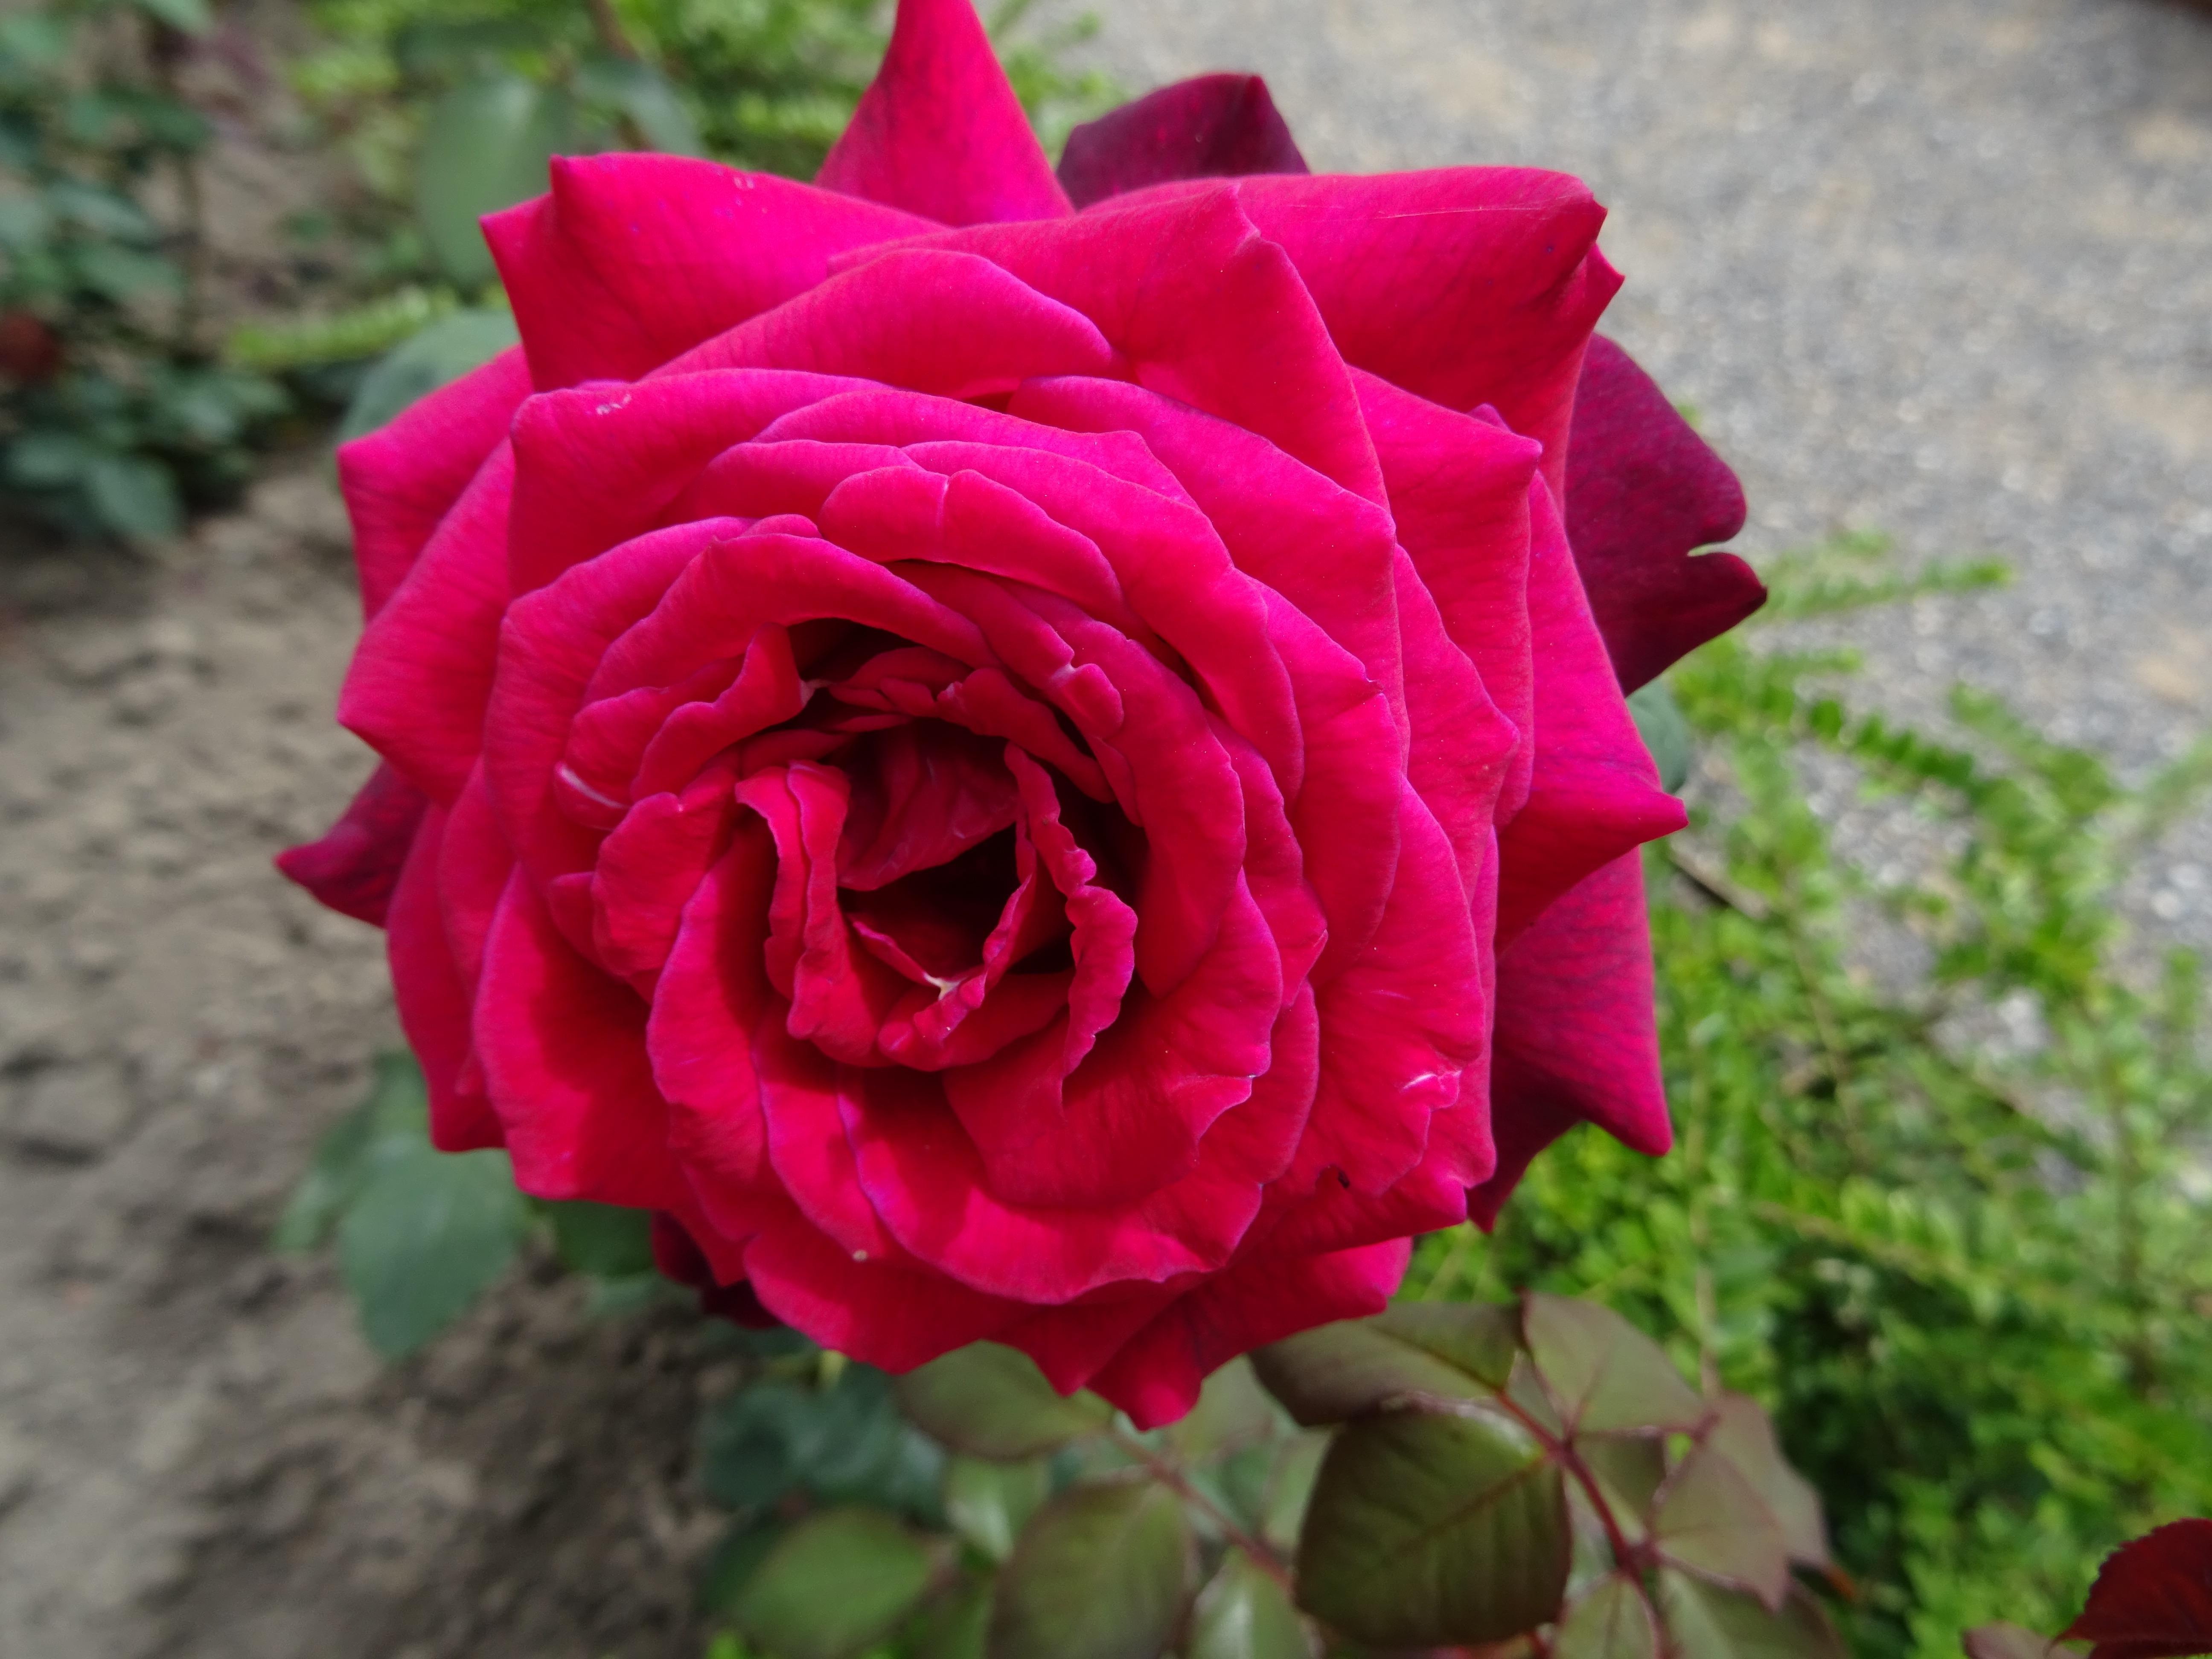 Gräfin Diana offene Blüte